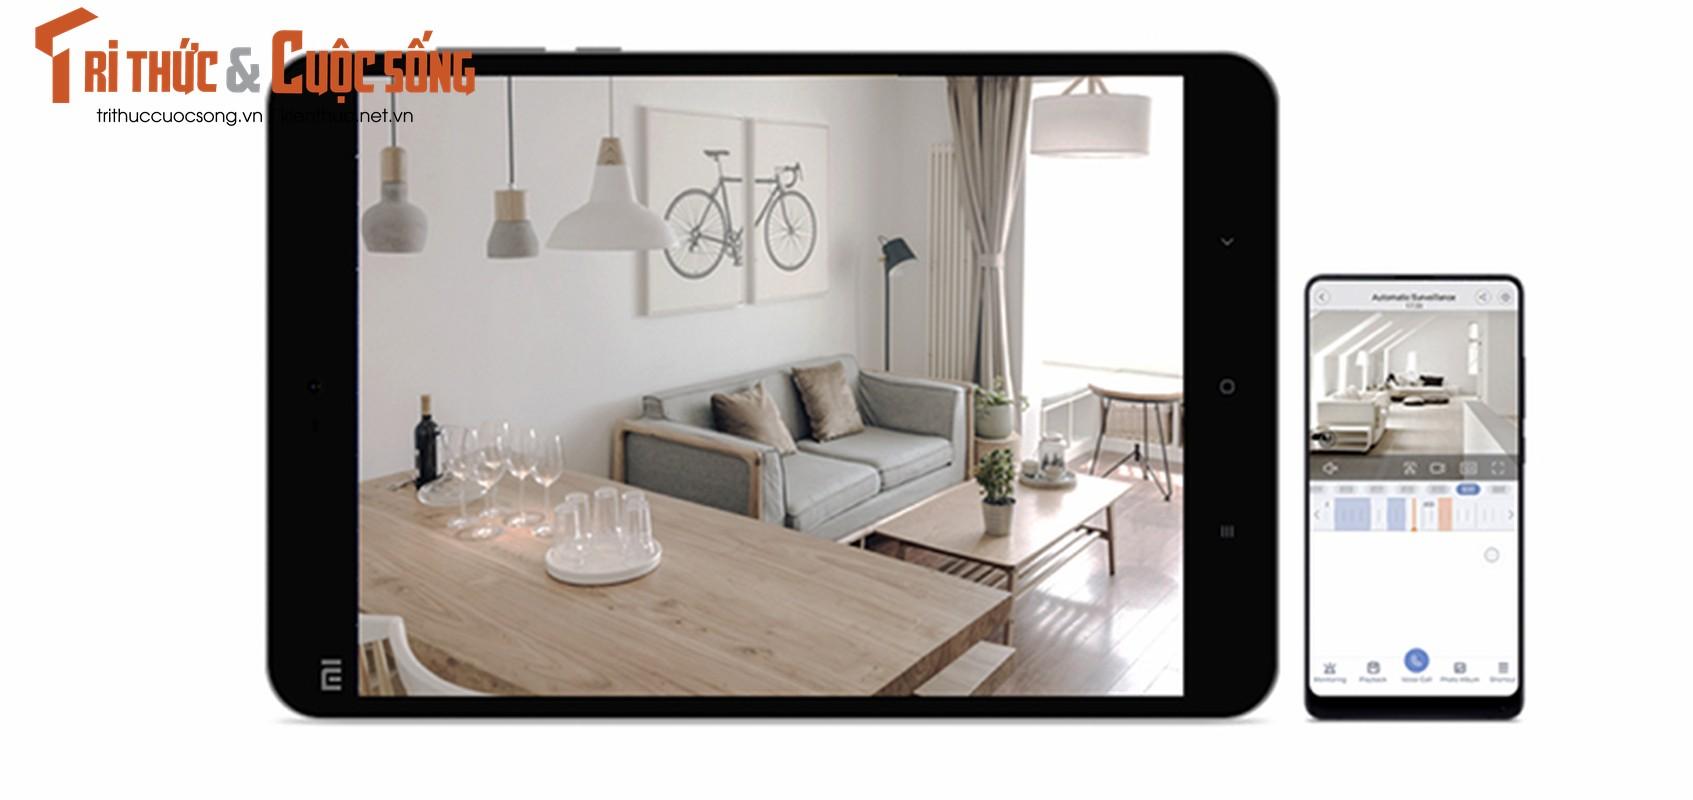 Chi tiet camera chong trom Xiaomi chat luong 2K xoay 360 do-Hinh-7